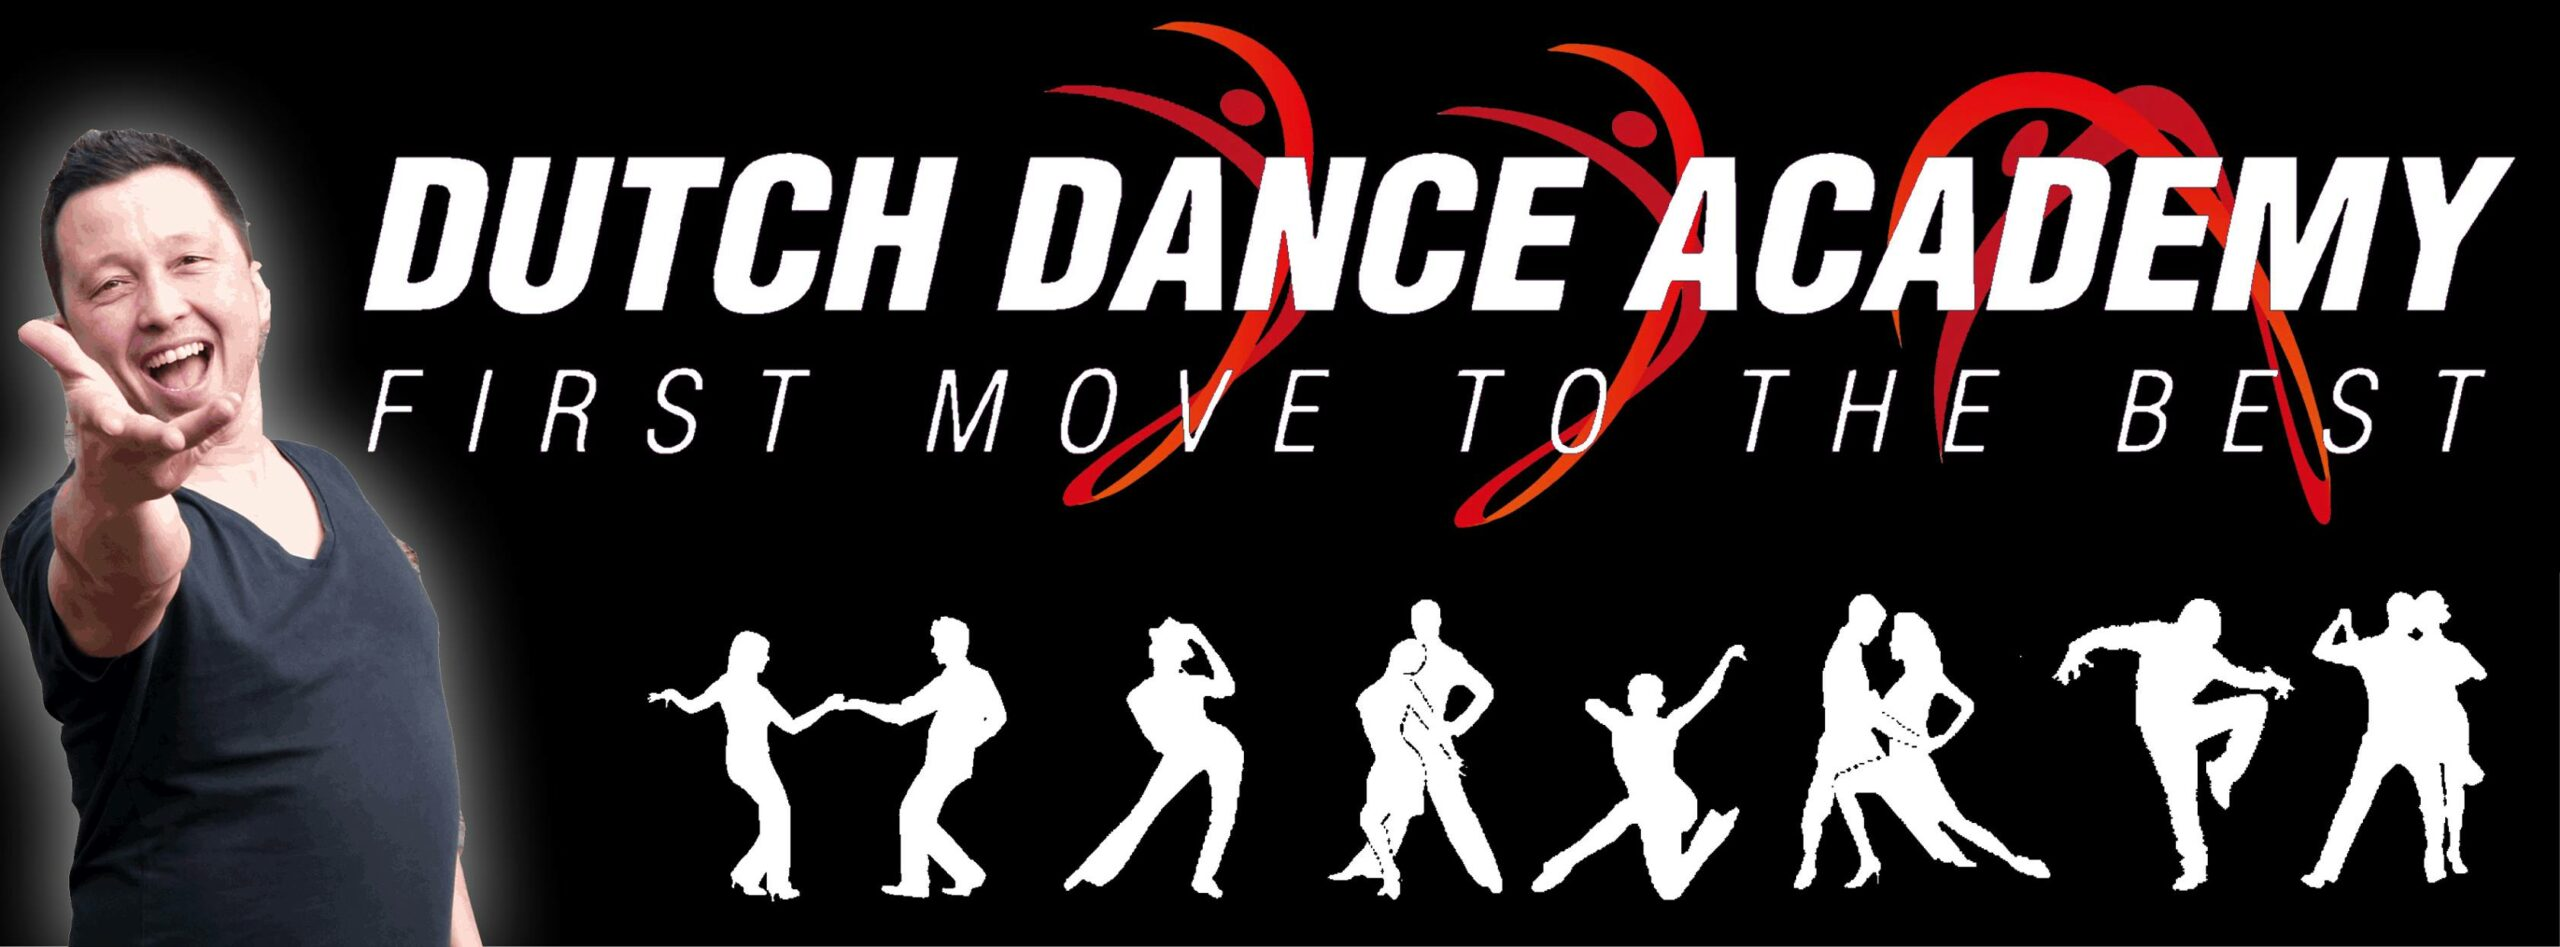 Dutch Dance Academy